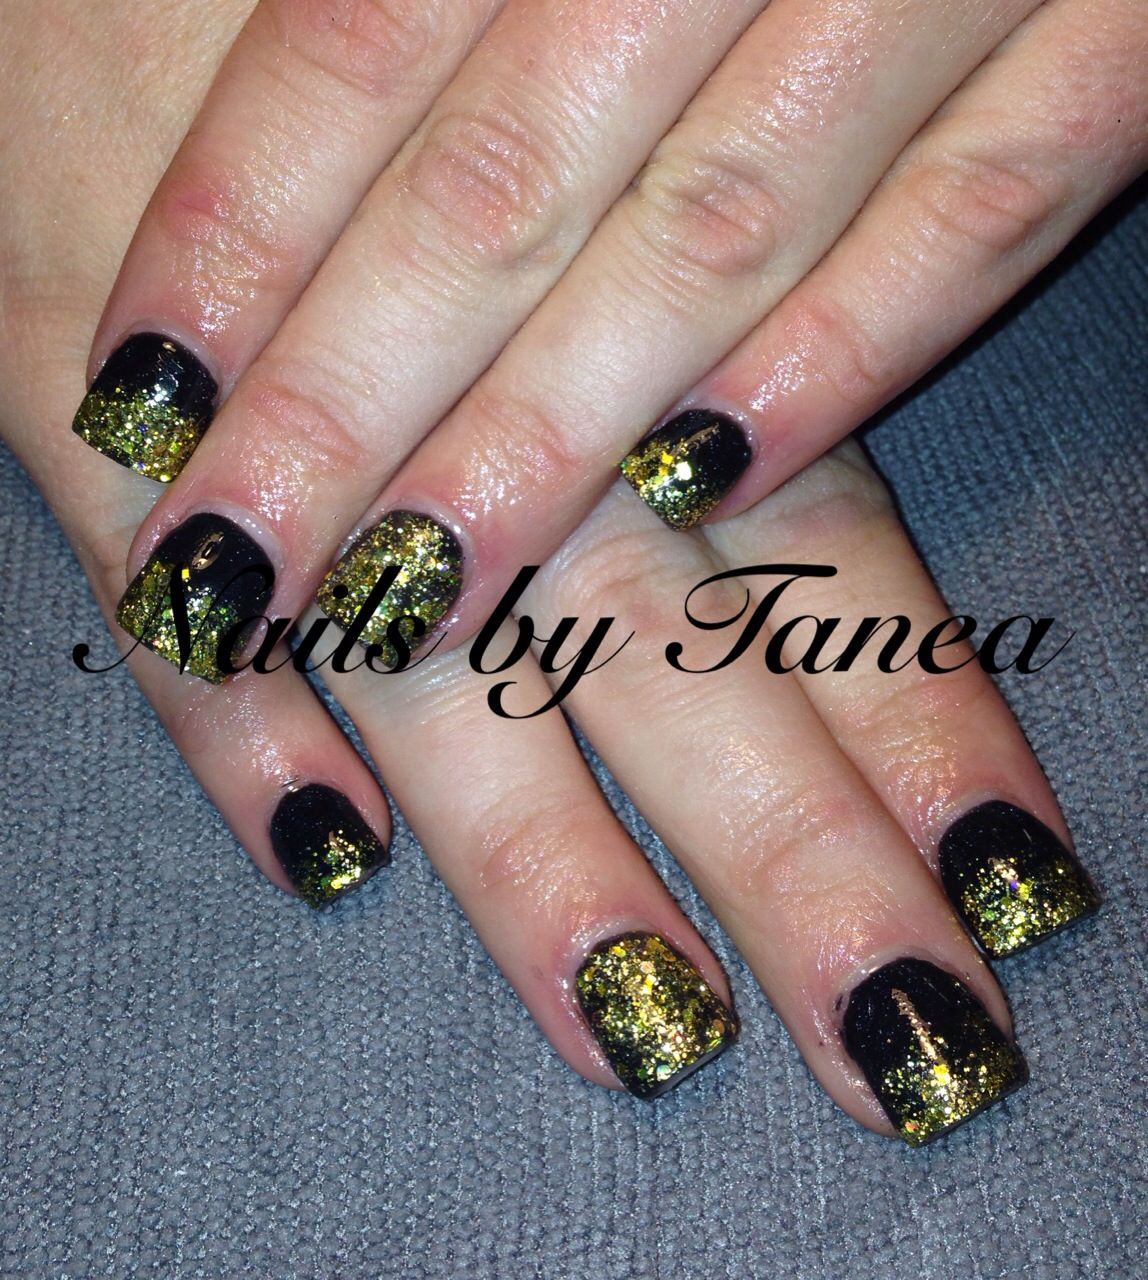 New Years nails. Nails 2013. Nailed by Tanea. Gel nails. Black and ...